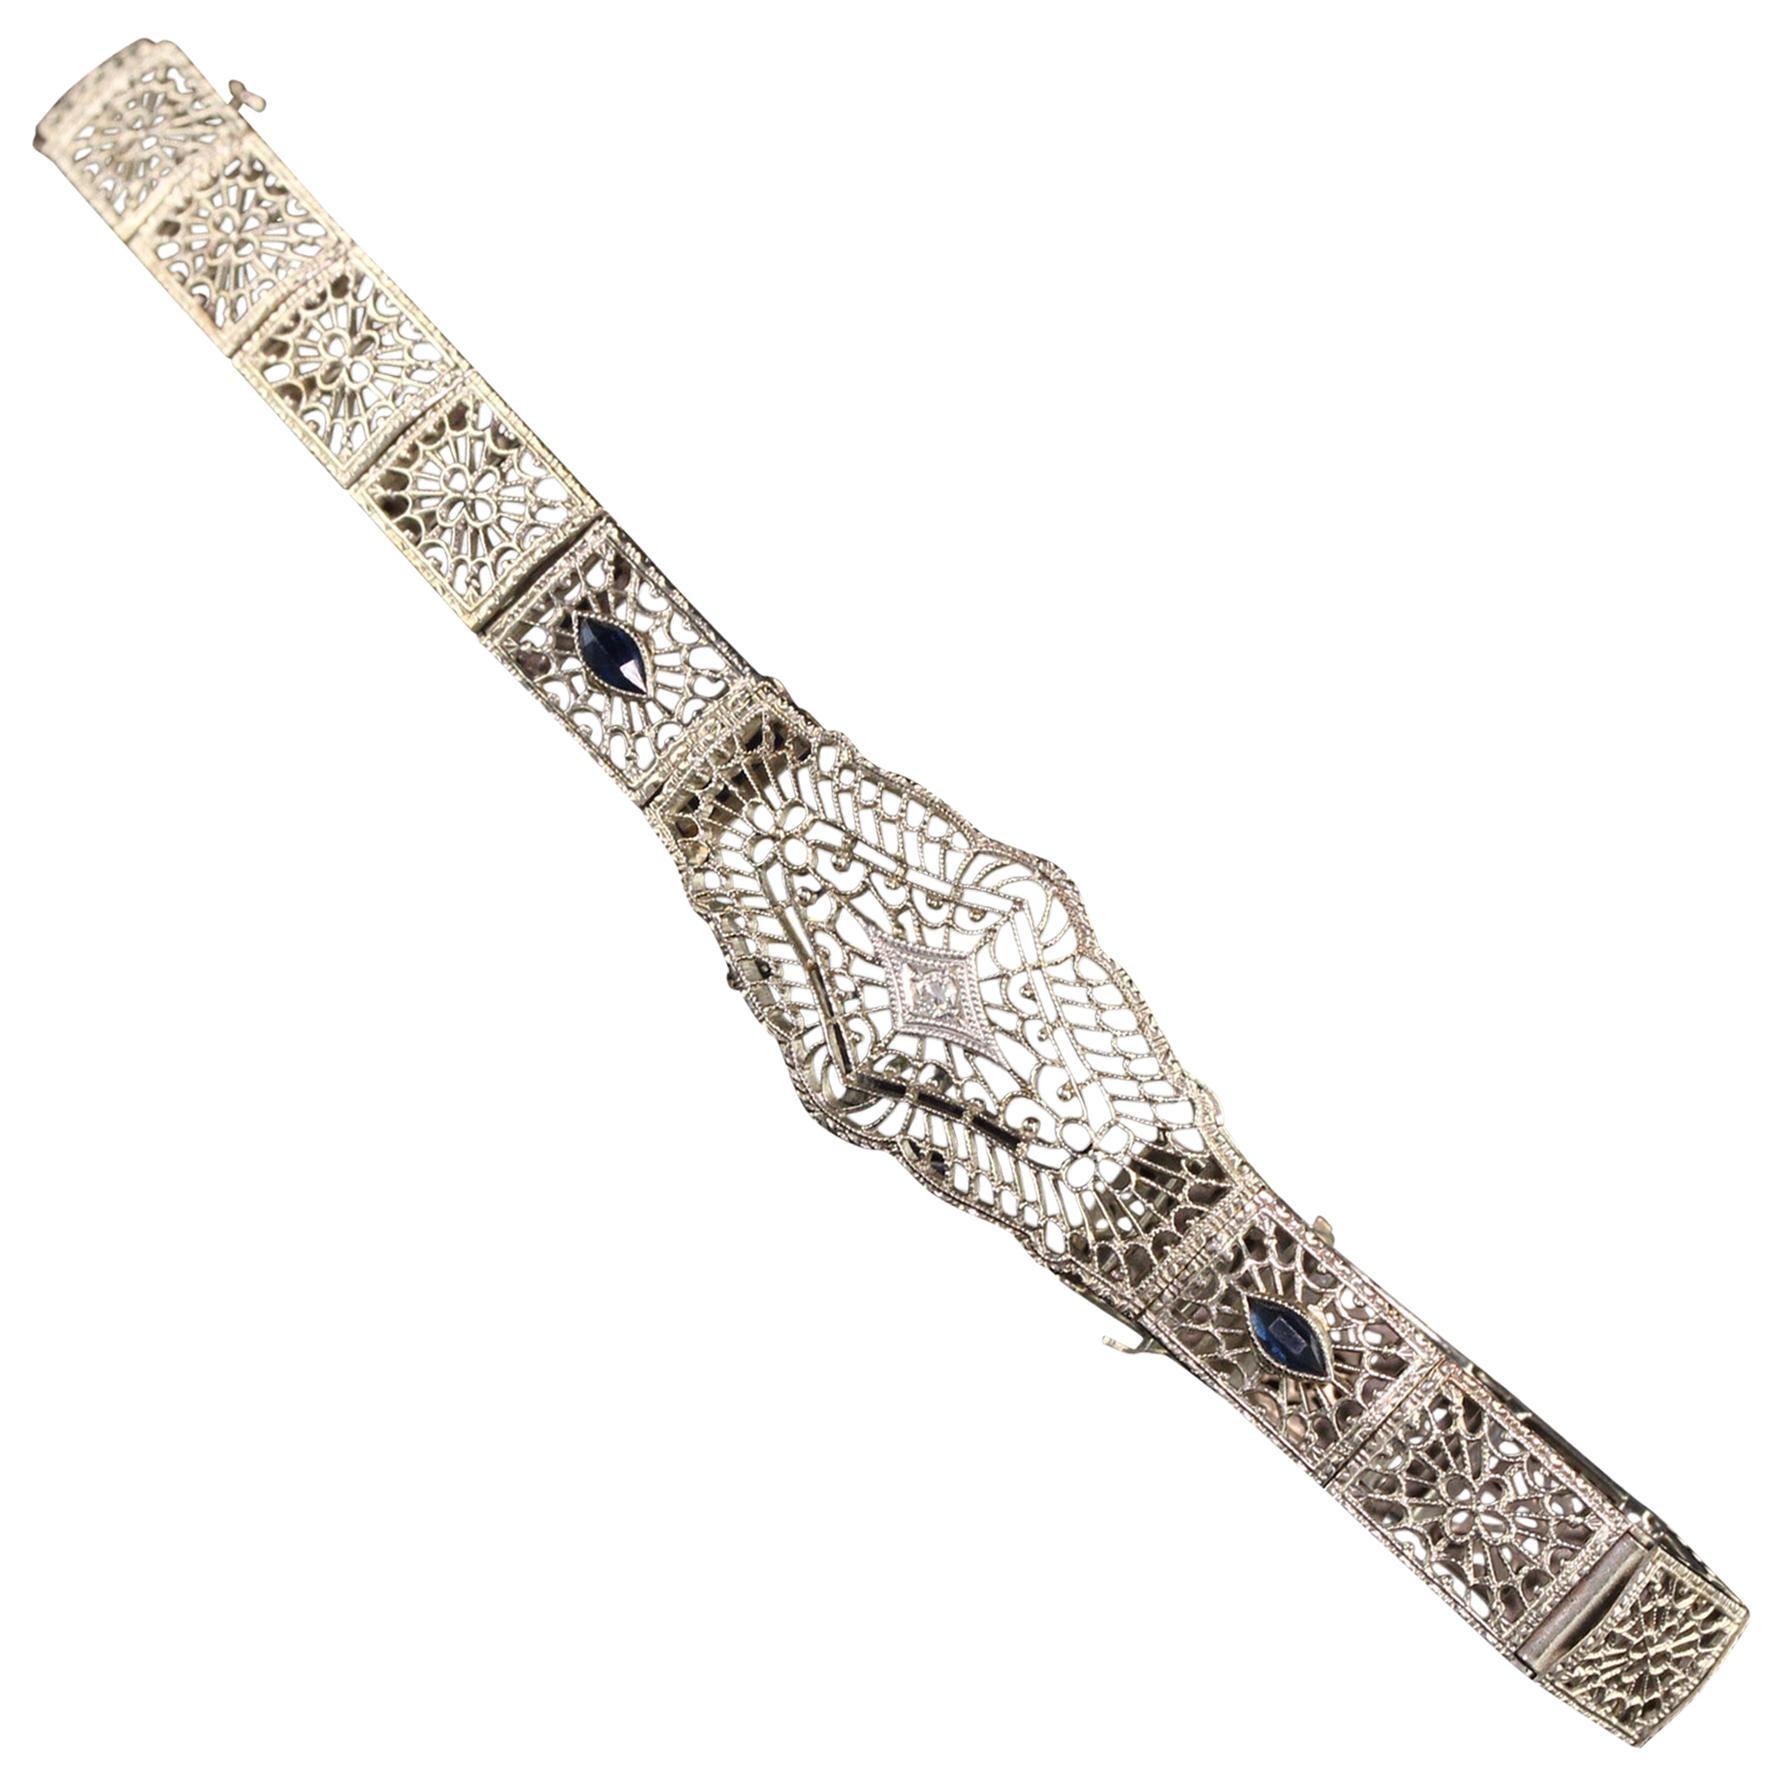 Antique Art Deco 10 Karat White Gold Diamond and Sapphire Filigree Bracelet